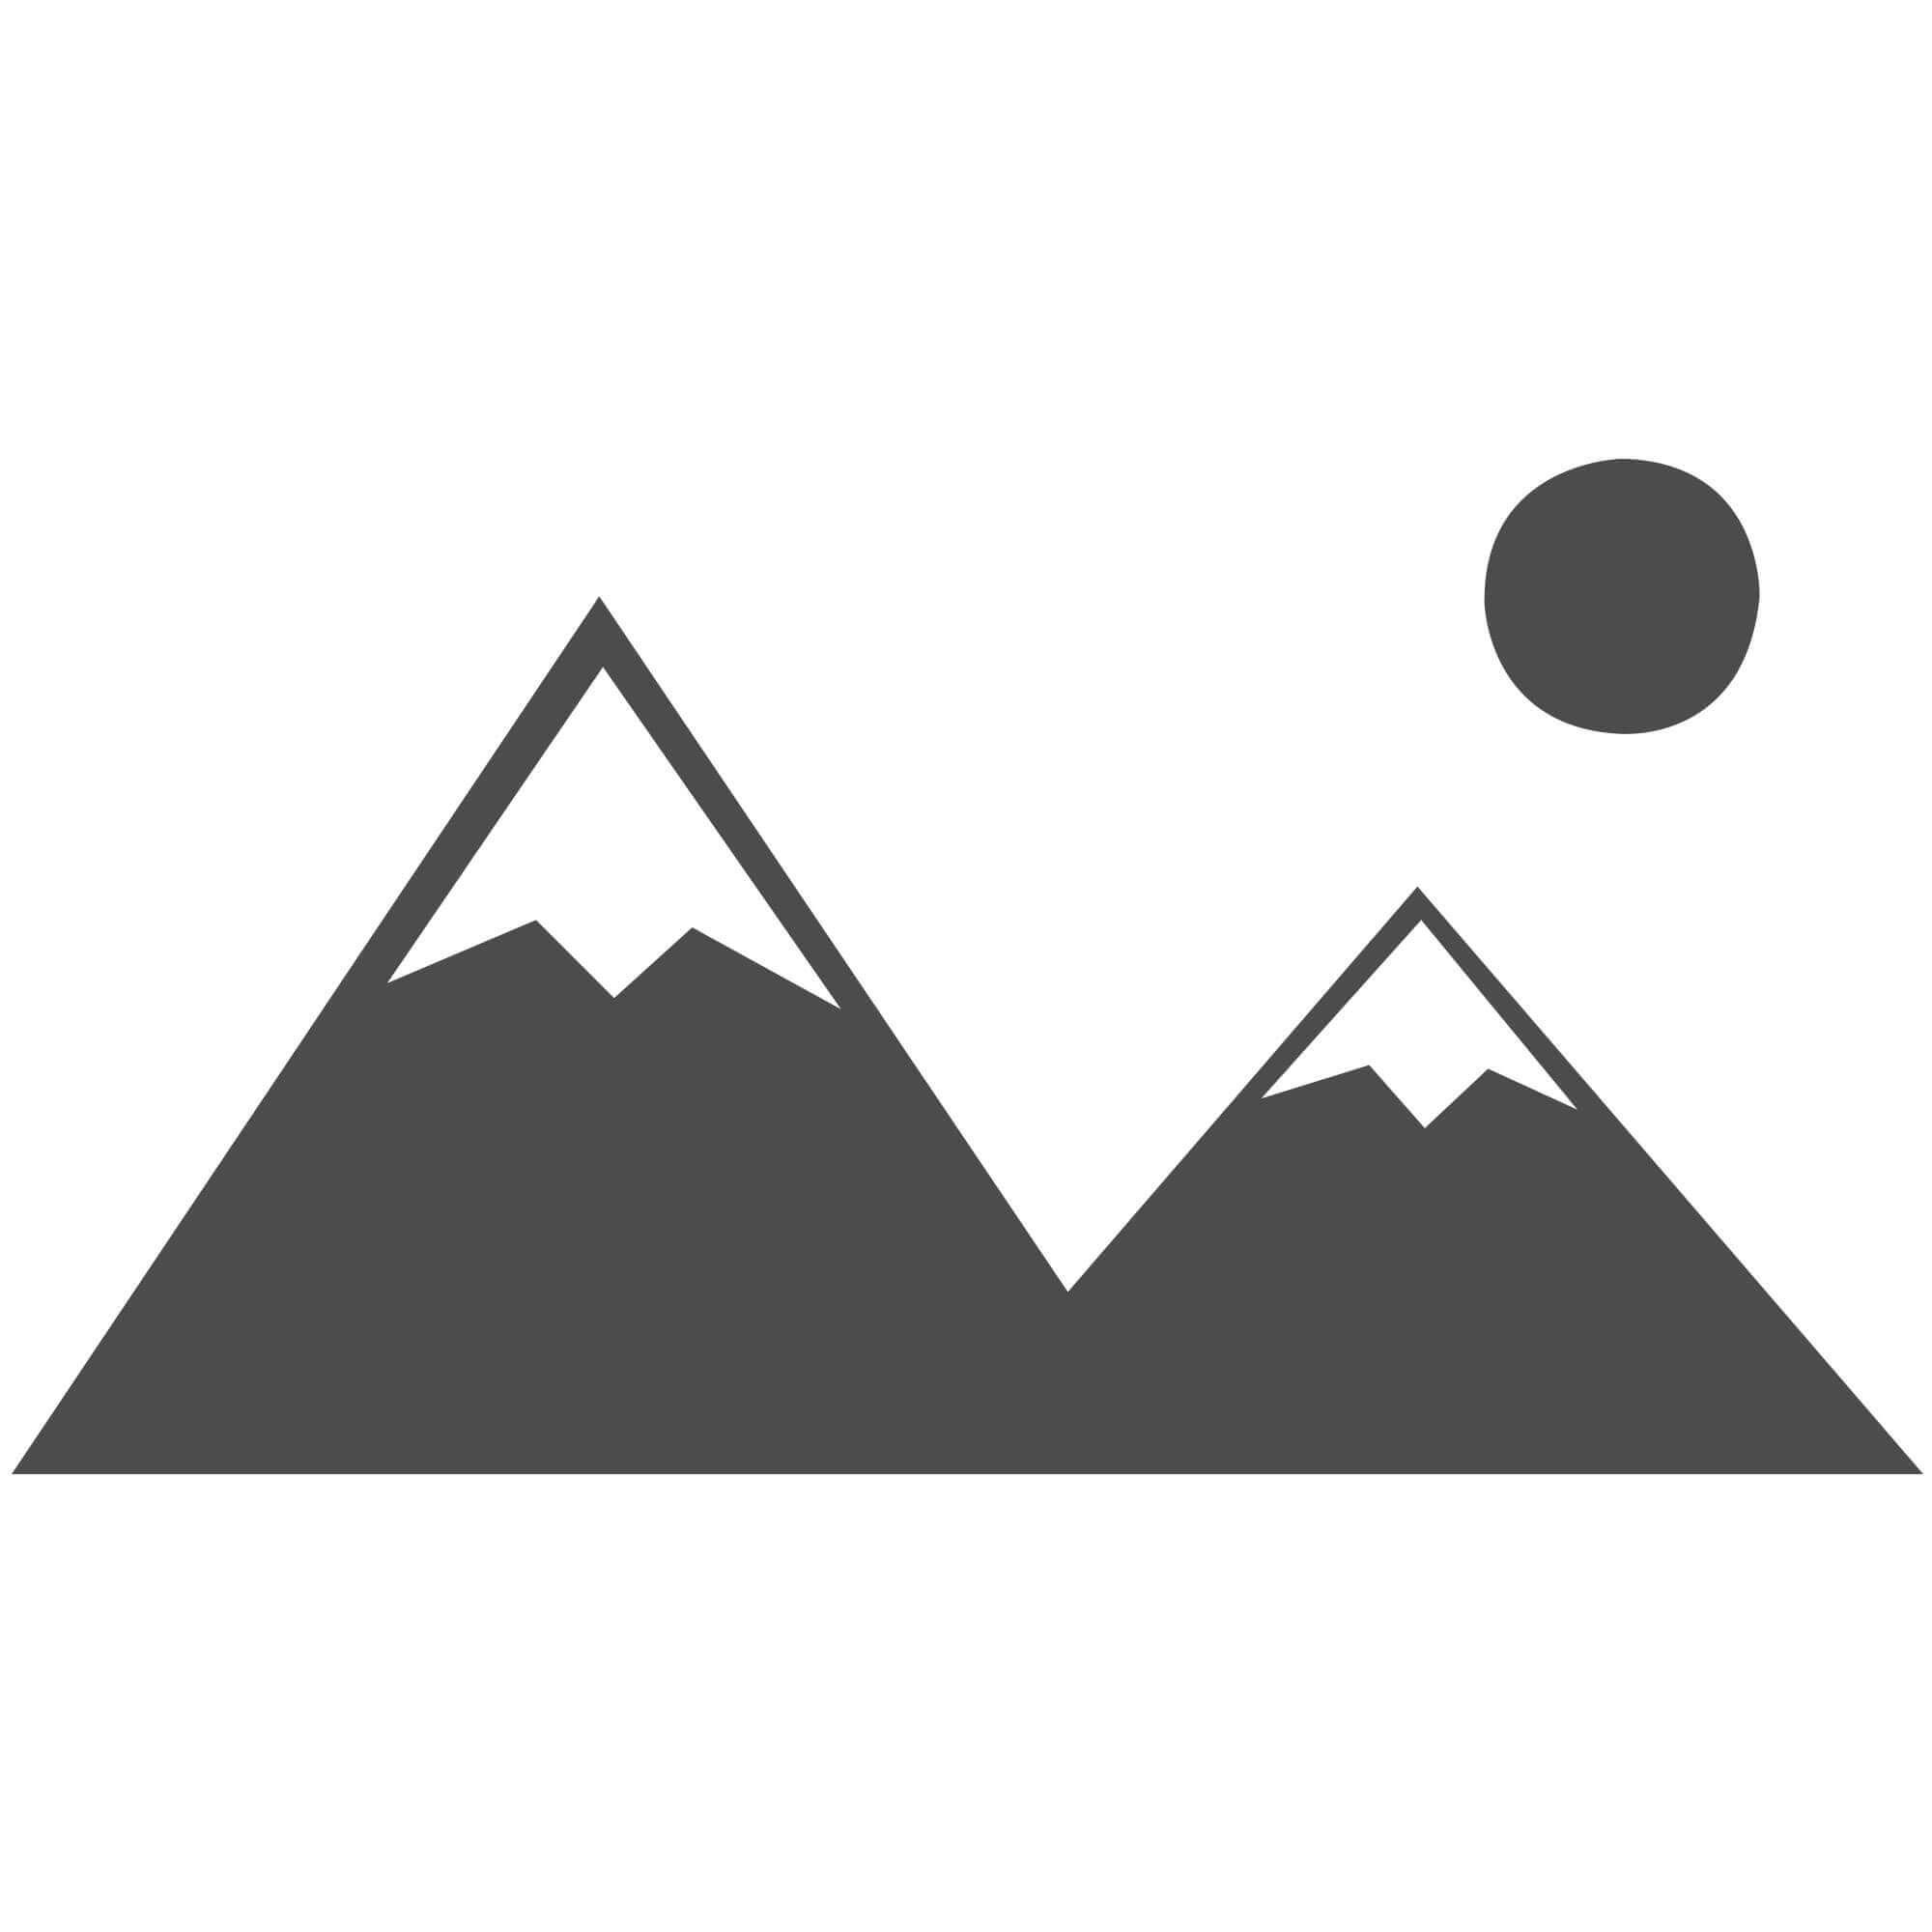 Royal Traditional Wool Rug - Rose-Half Moon 67 x 137 cm